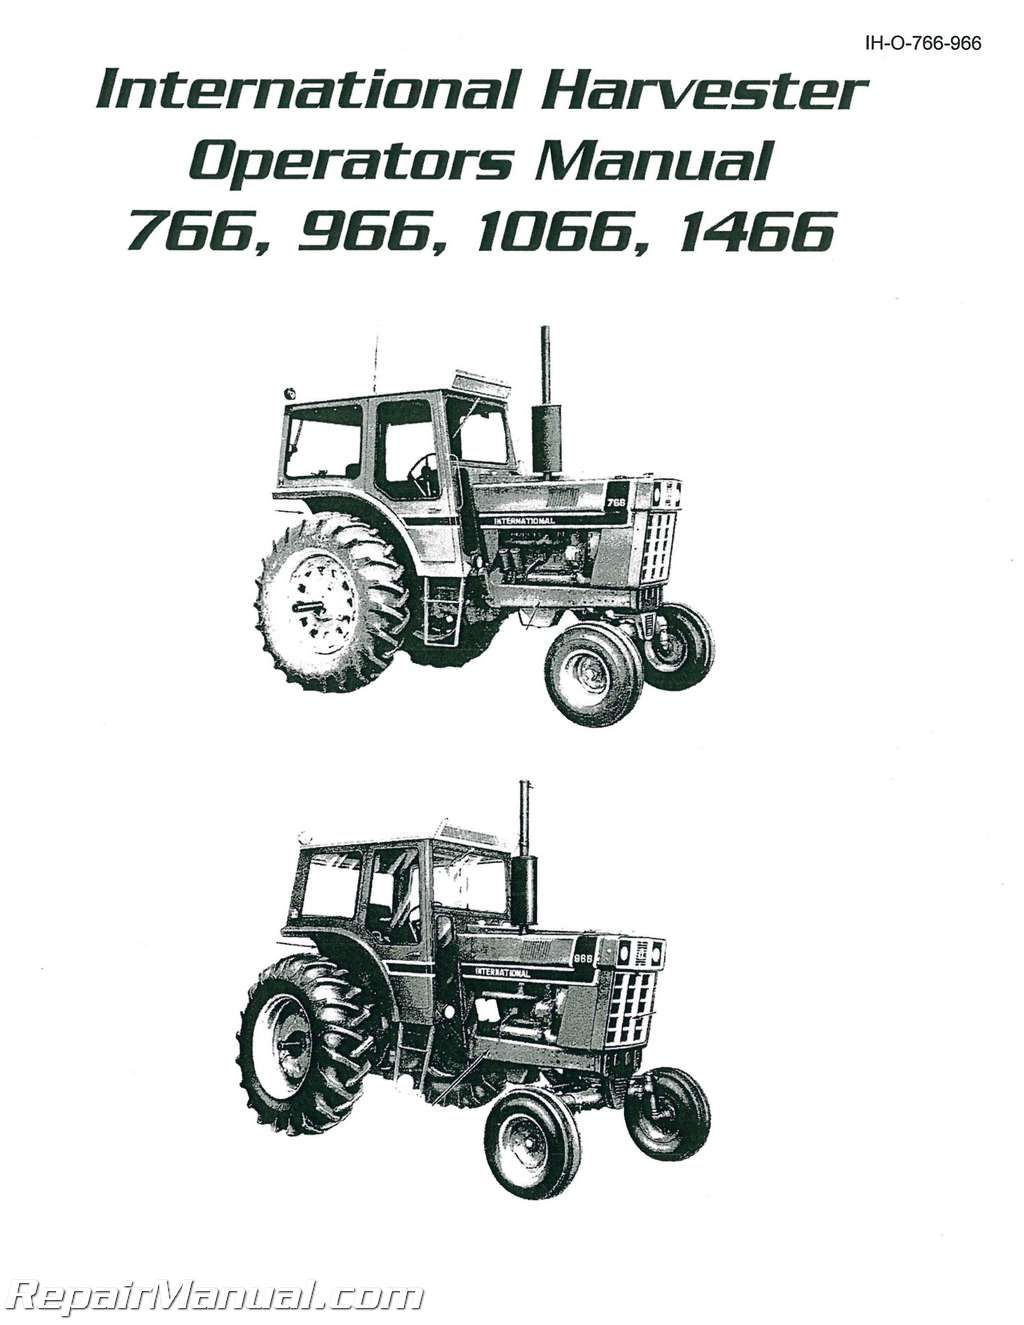 Farmall Fuel Filter Diagram Electrical Wiring Ford Explorer International 966 826 Change Car